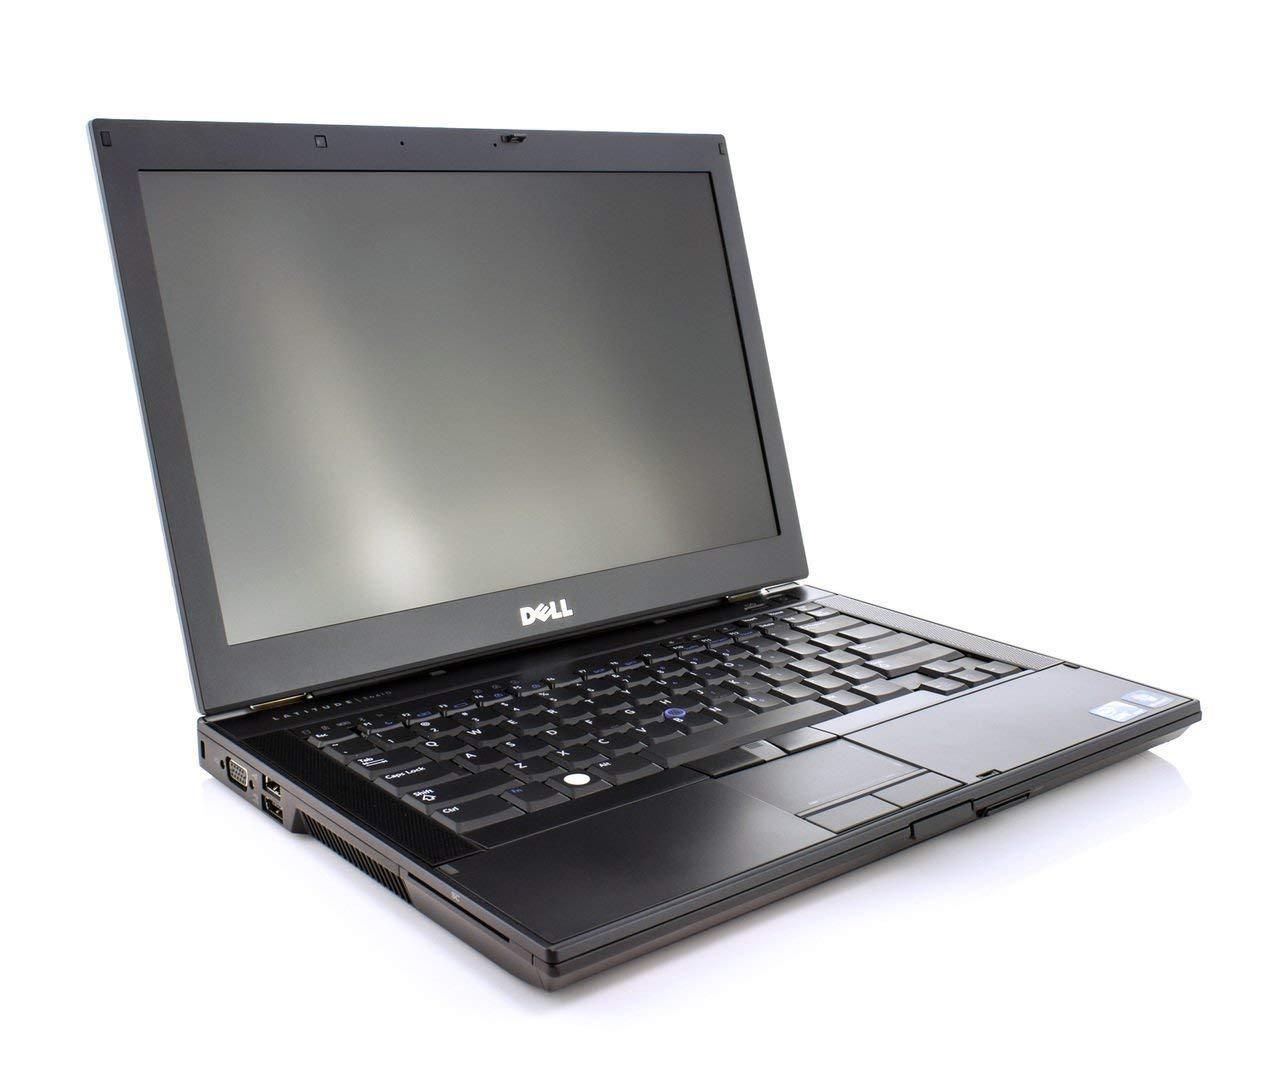 لابتوب DELL E6410 إستيراد الخارج - كور i5 - هارد 320 جيجا - رام 4 جيجا